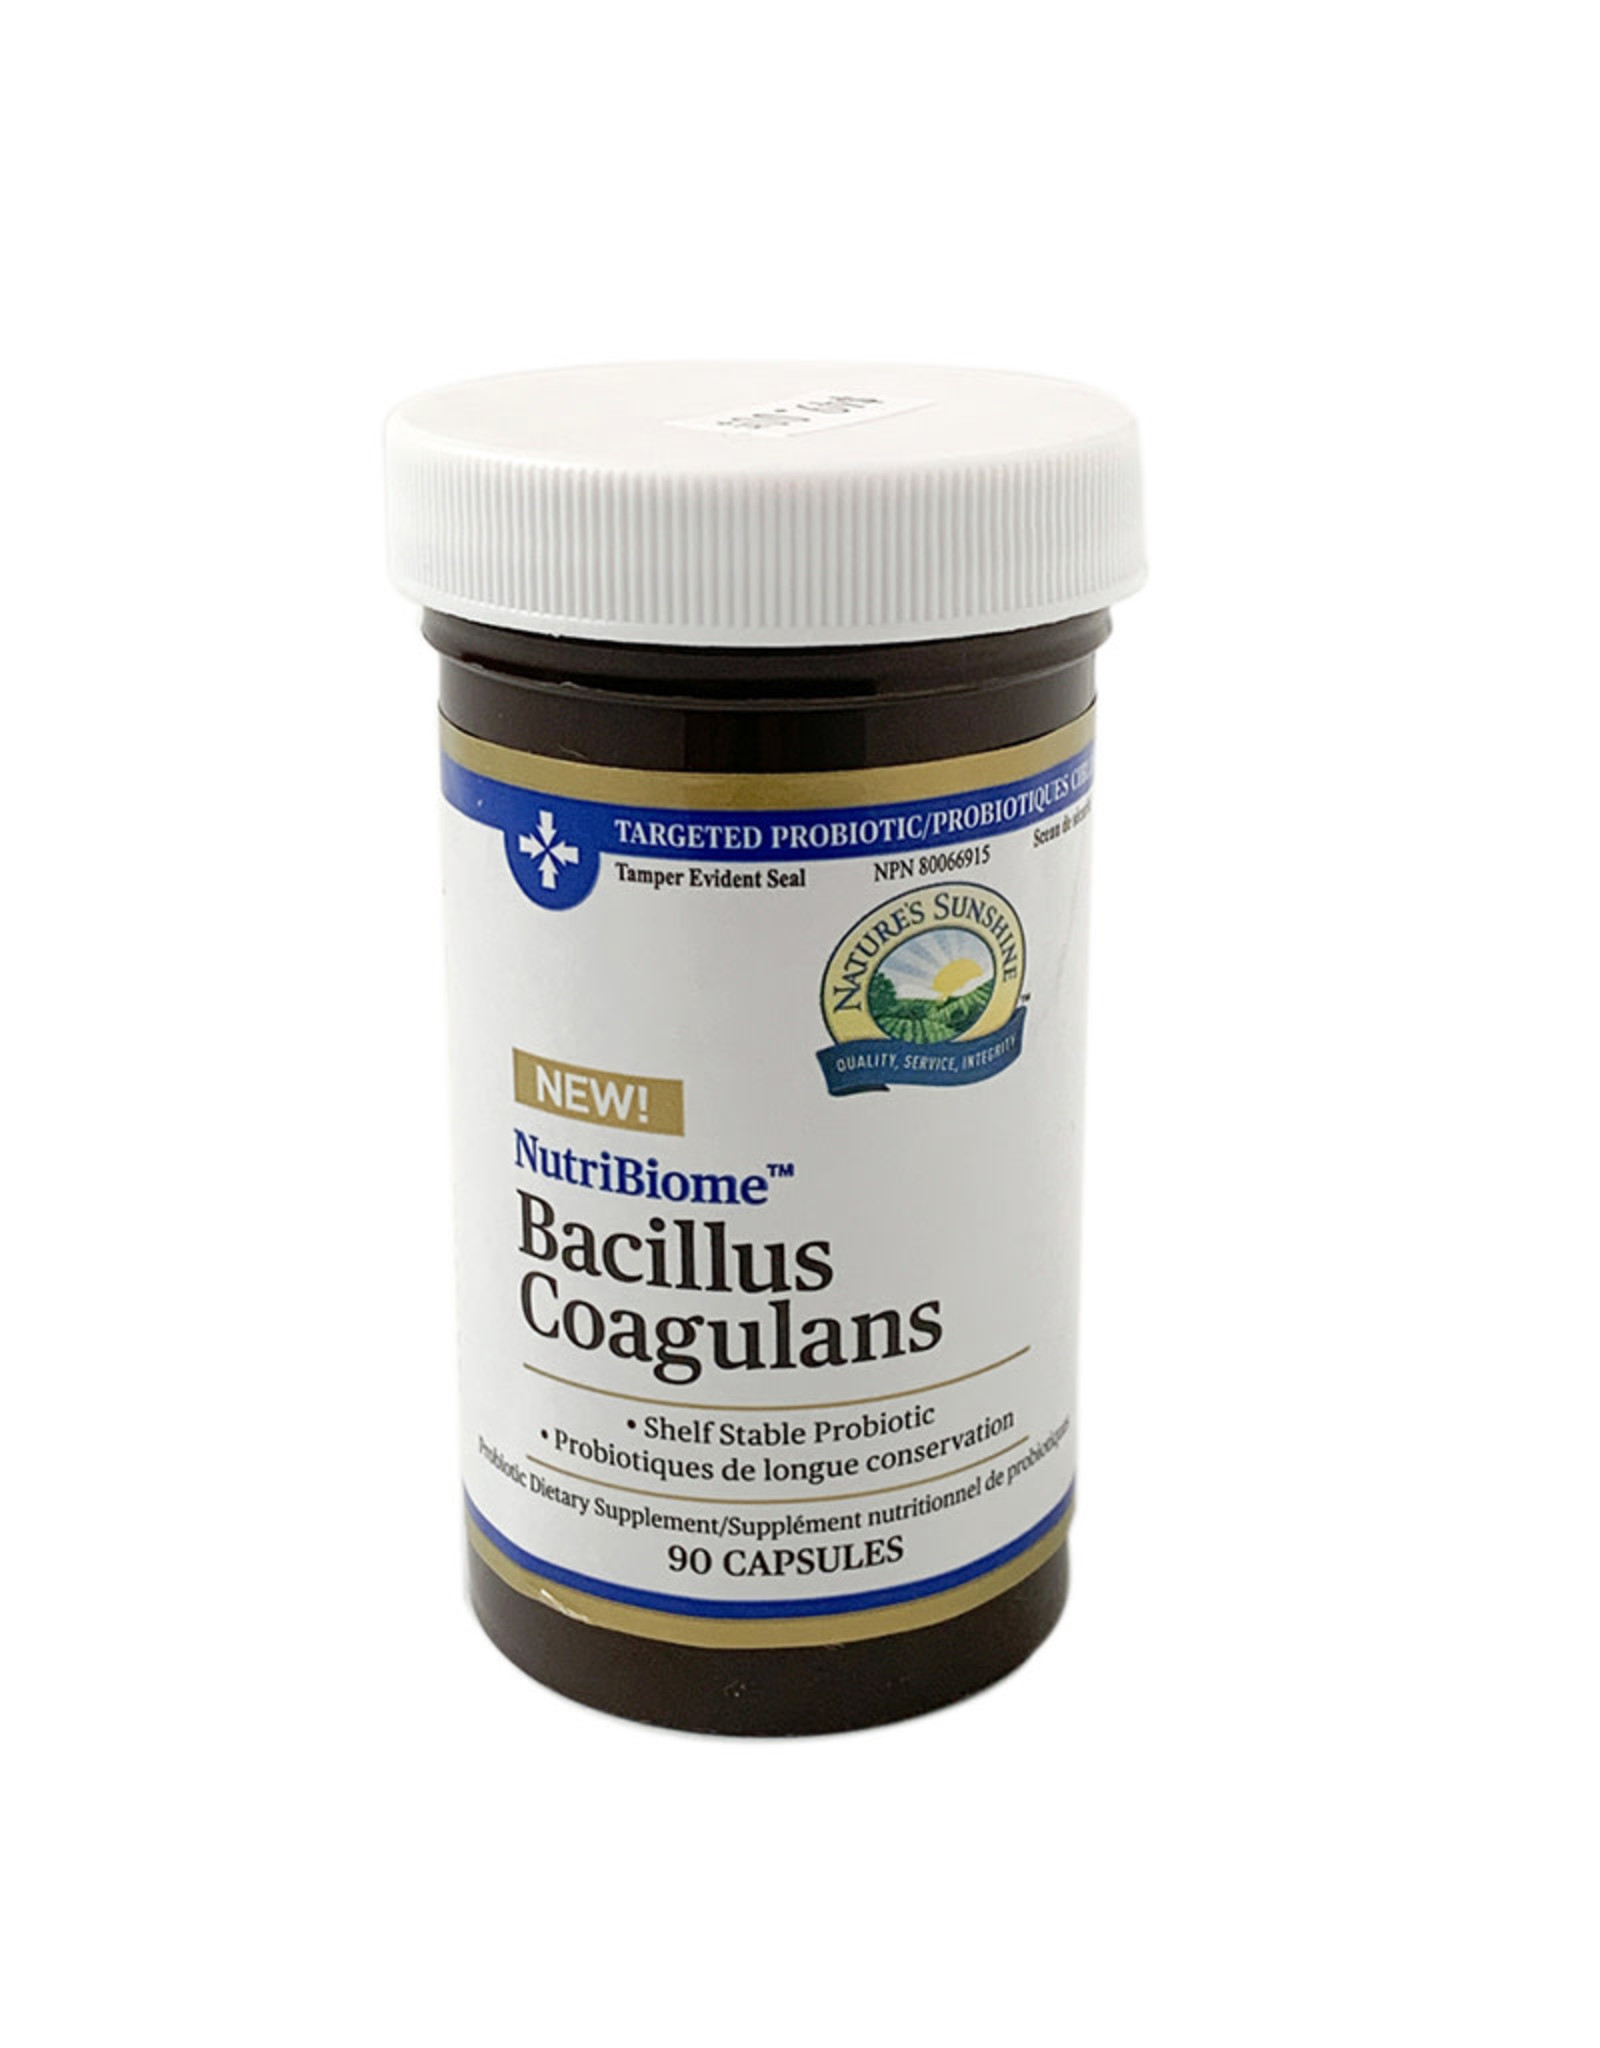 Natures Sunshine NS - Bacillus Coagulans (90 caps)